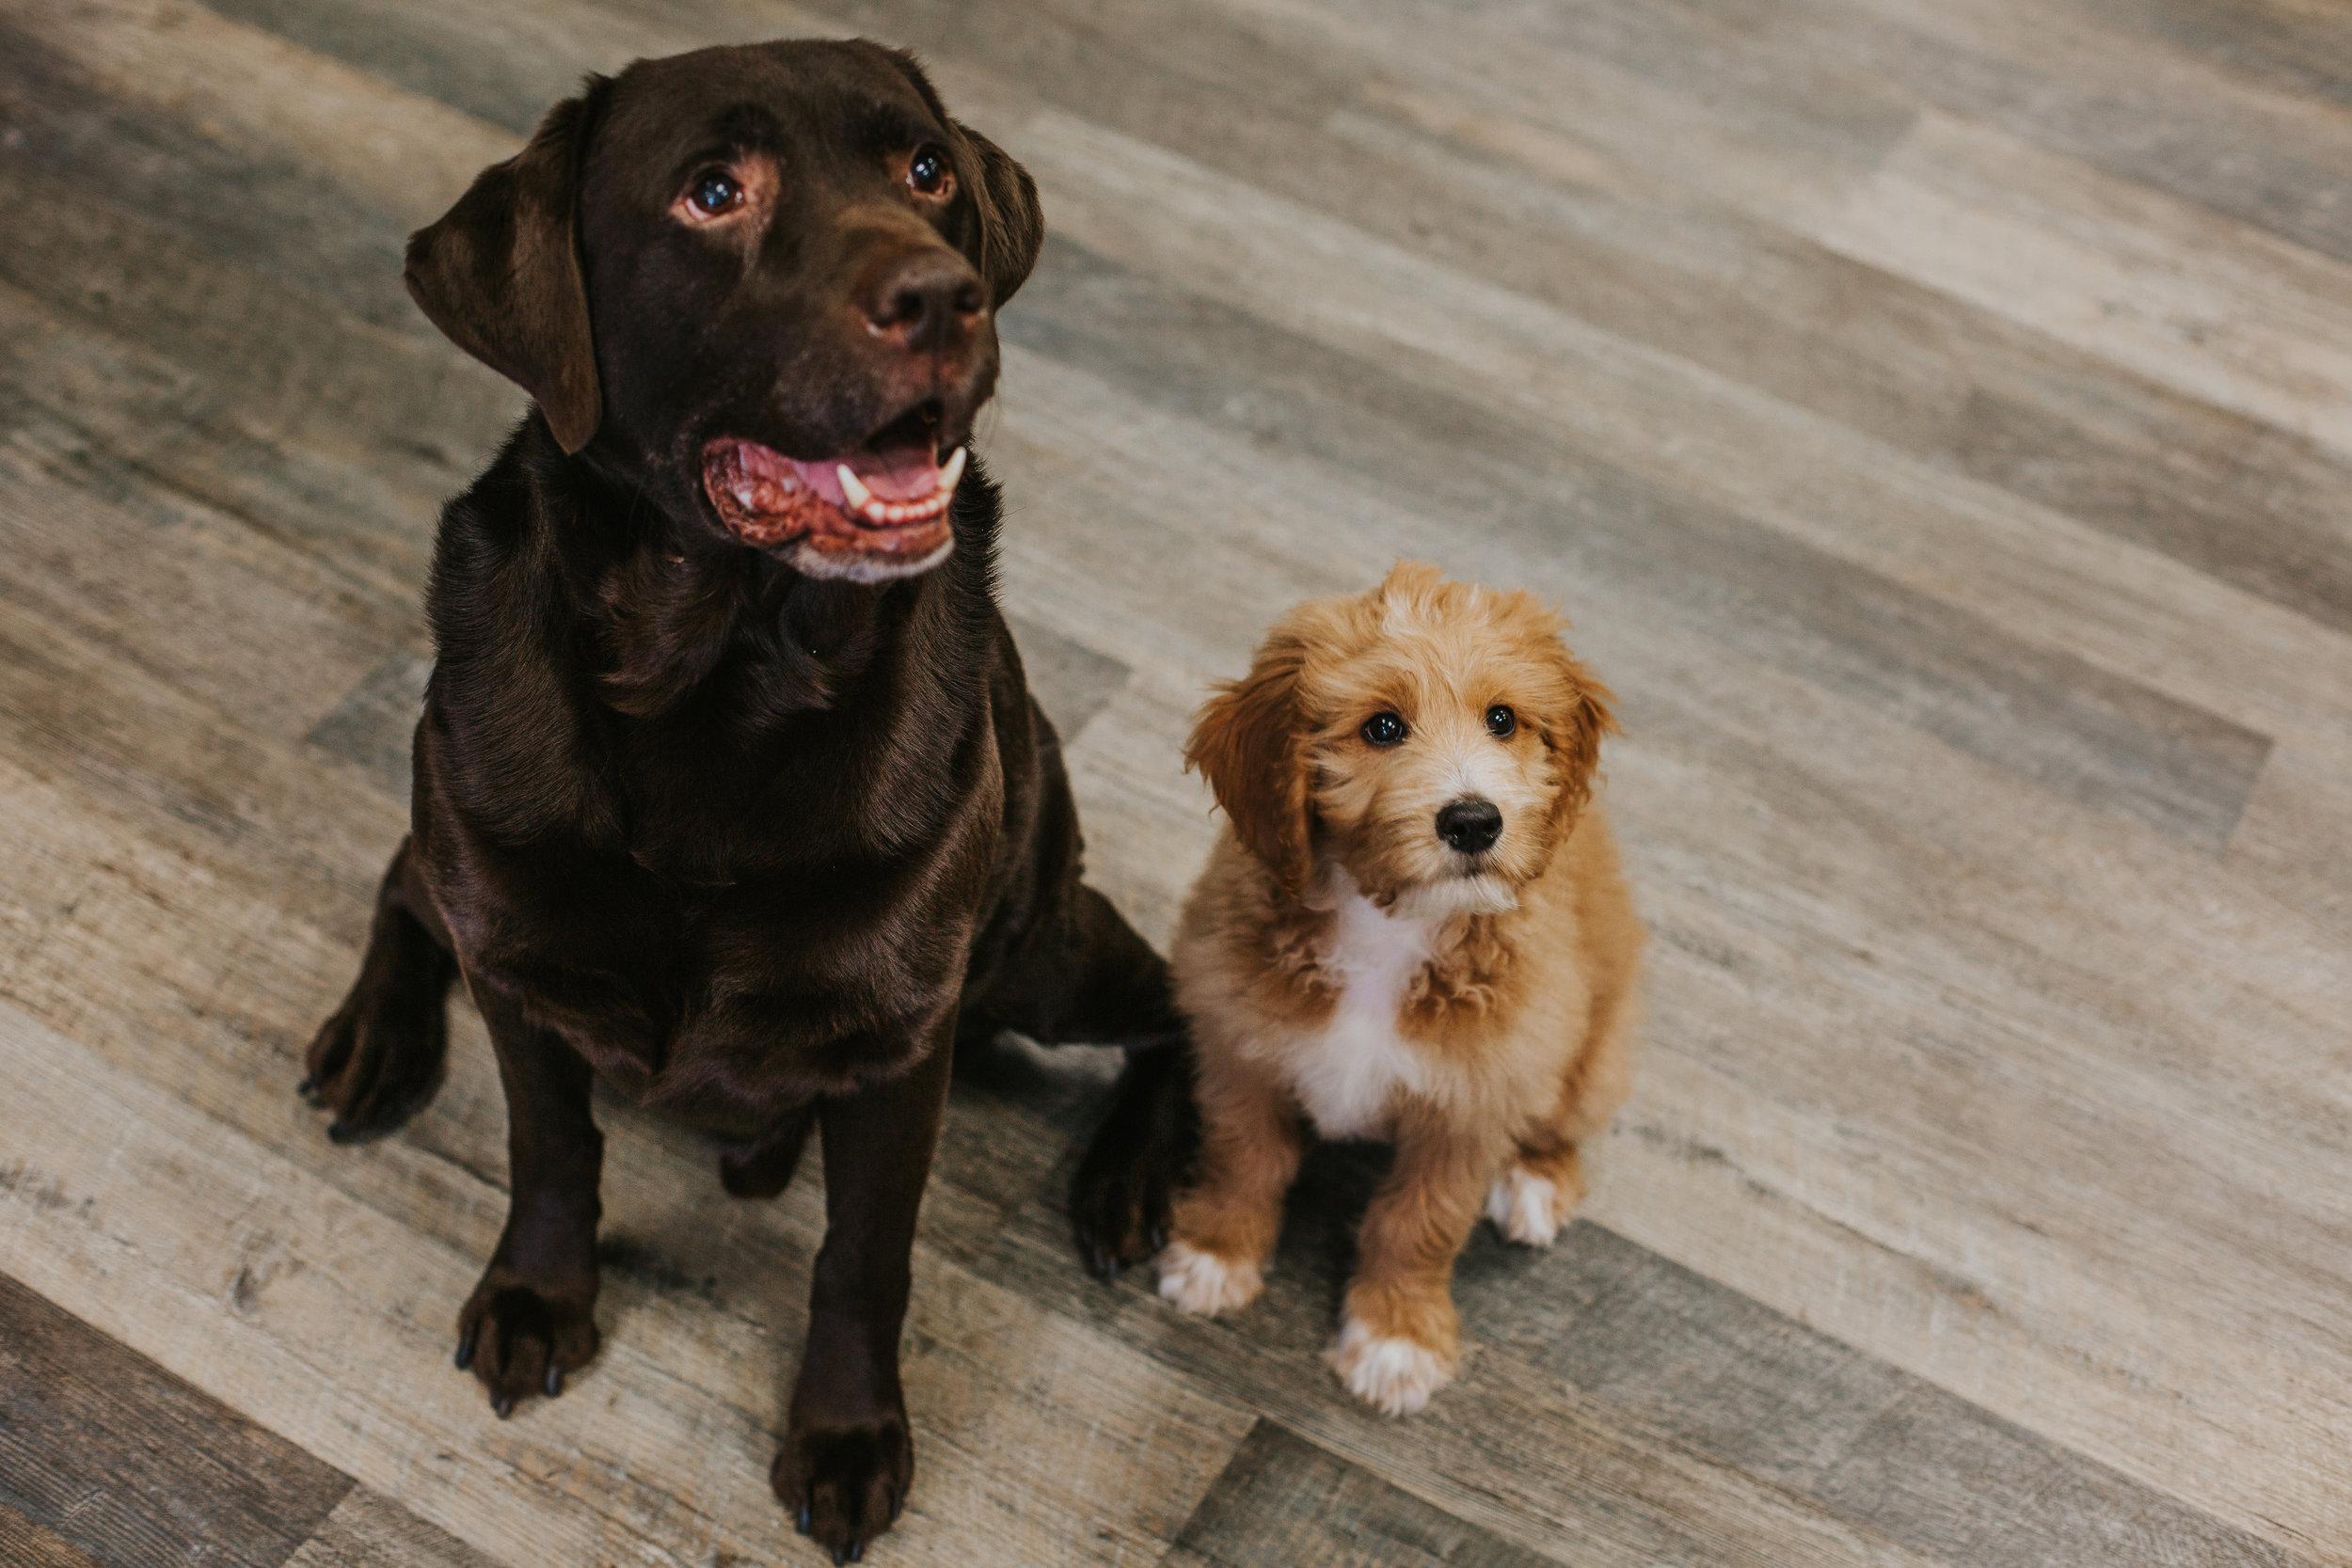 Jco-Natural-Pet-Eugene-Oregon-Puppies.jpg